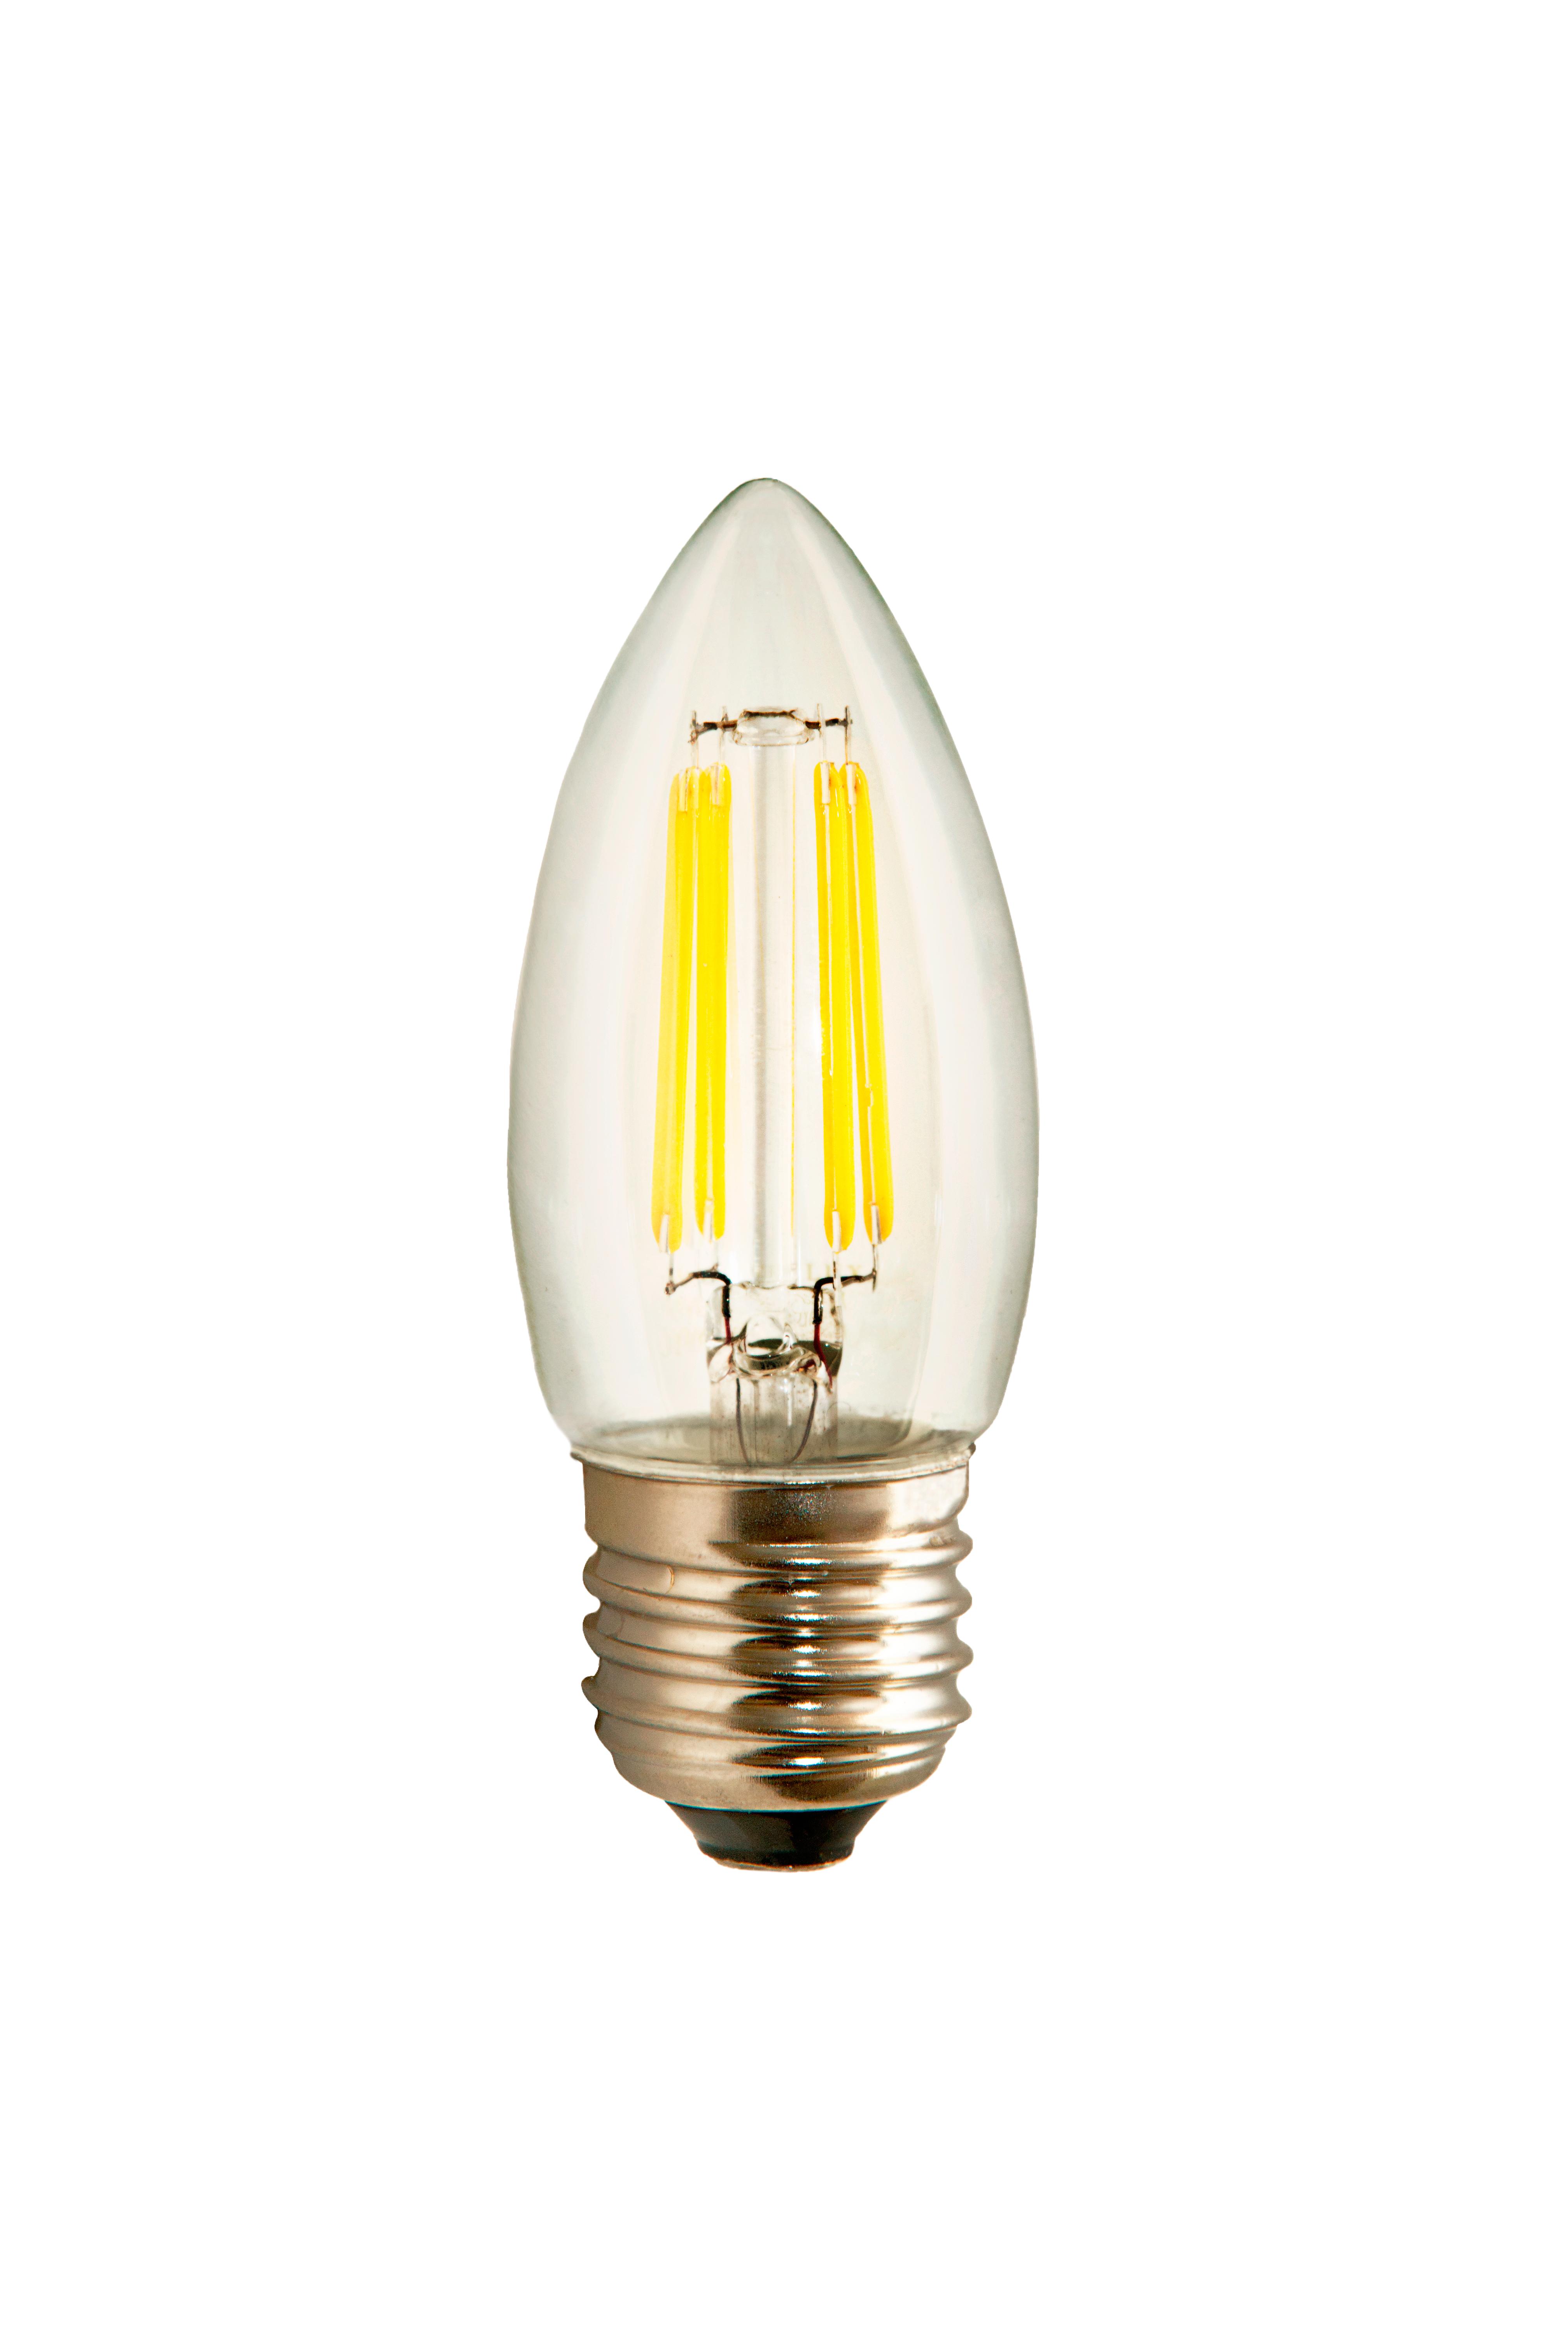 Светодиодная лампа VKlux BK-27W5C30 Edison, 5Вт, 3000К